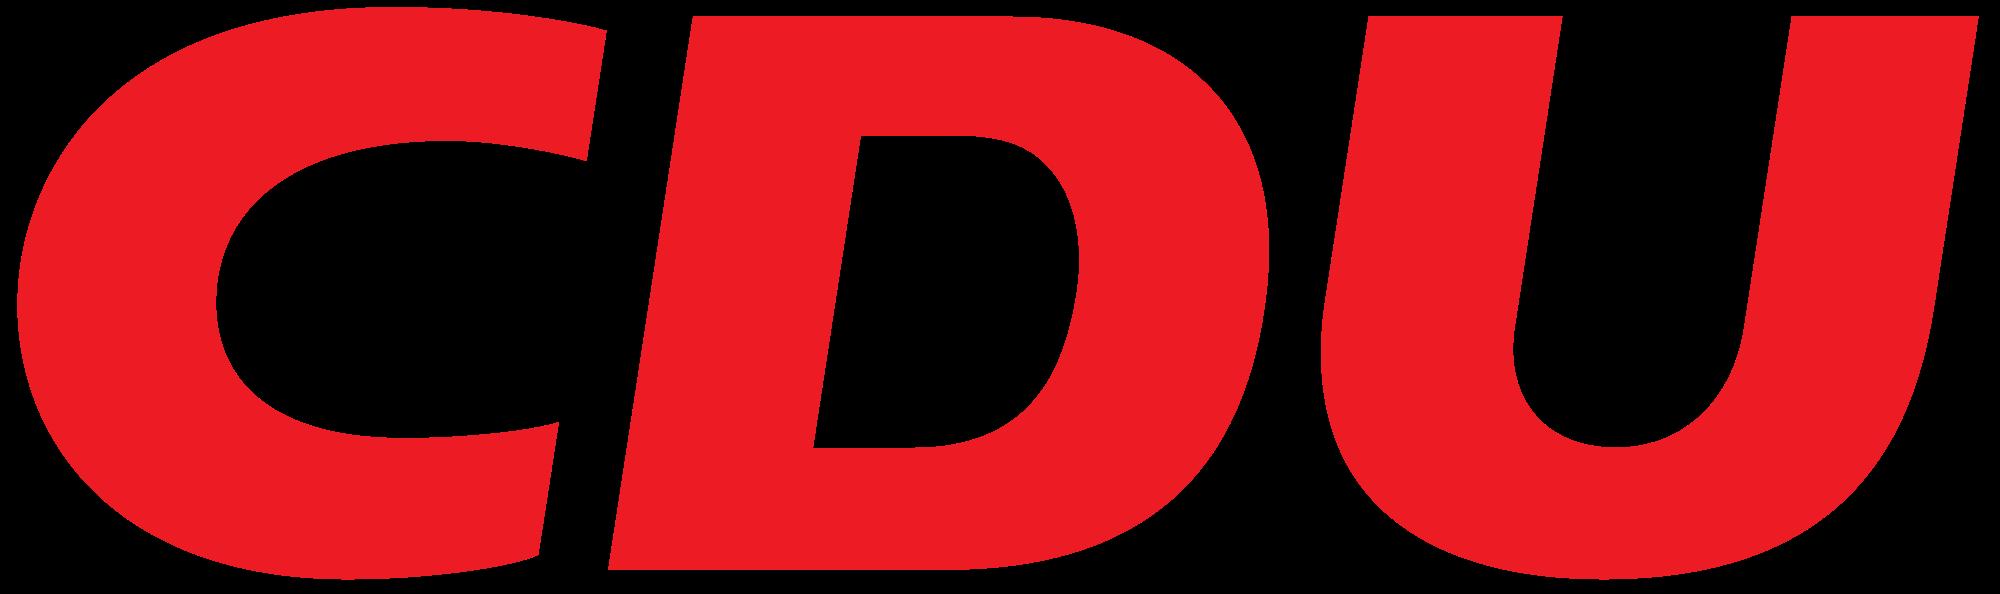 CDU_Logo